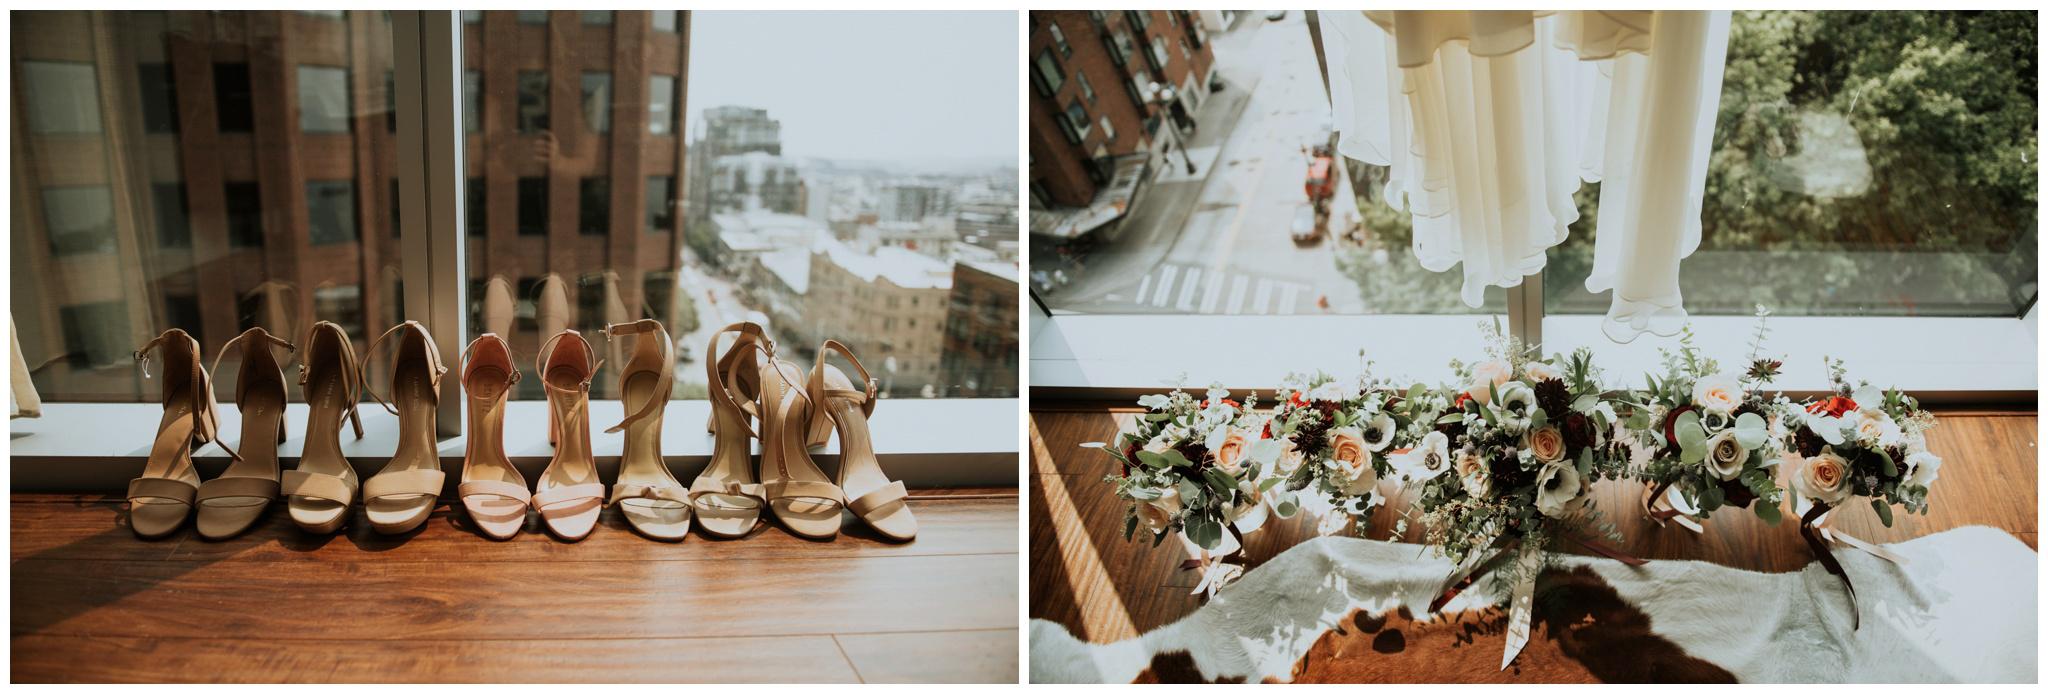 alyssa-keiran-westland-distillery-urban-seattle-wedding-photographer-caitlyn-nikula-28.jpg